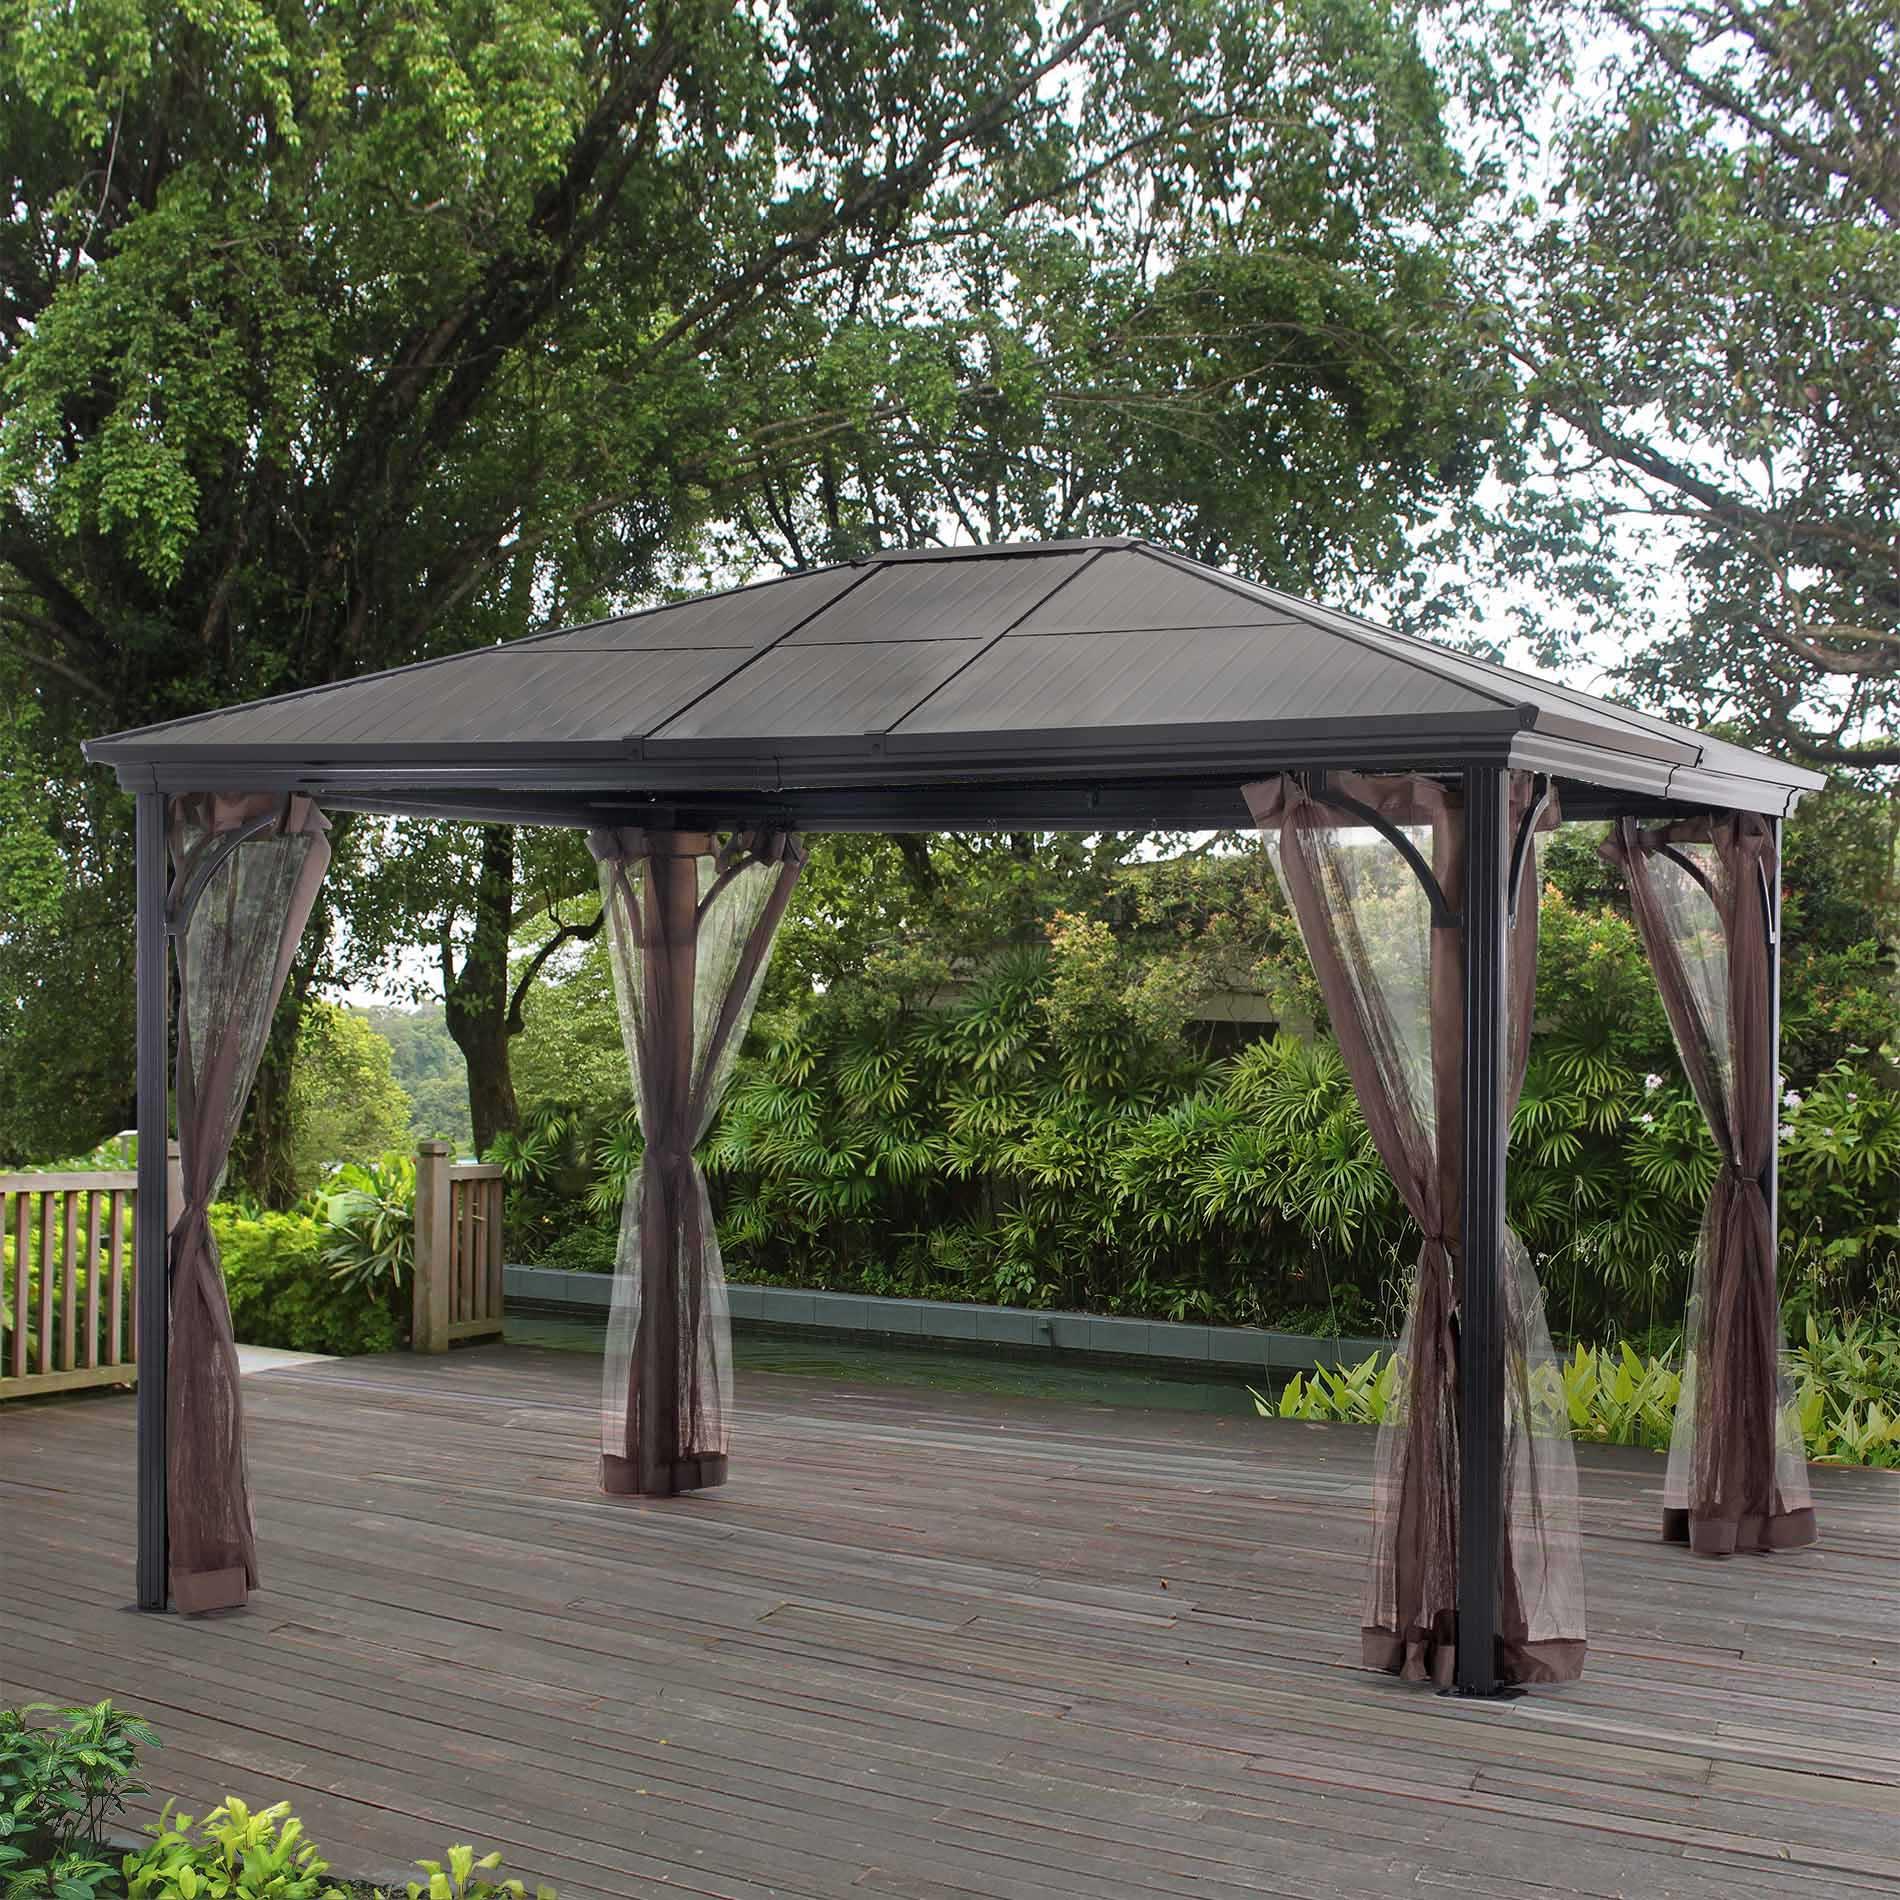 Grand Resort Sunland Park 12x10 Steel Roof Gazebo With